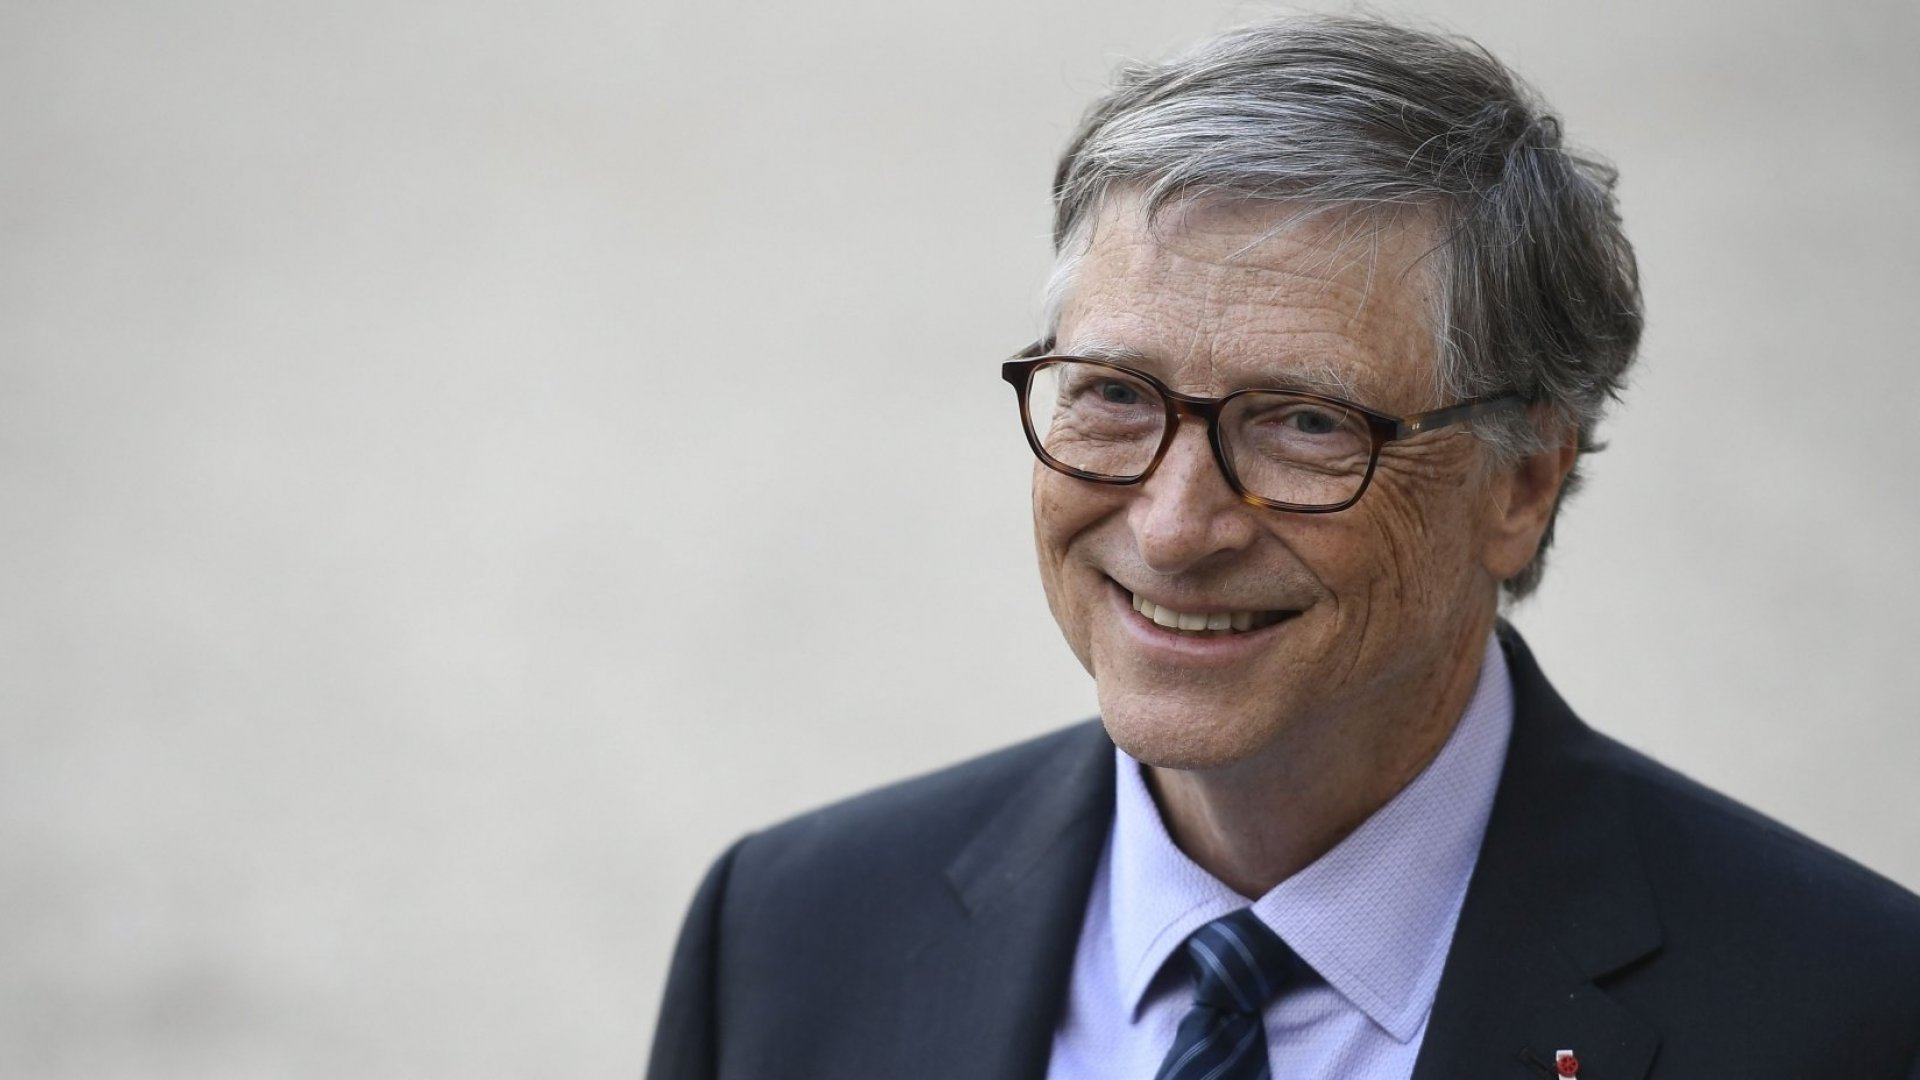 Microsoft co-founder and billionaire philanthropist Bill Gates